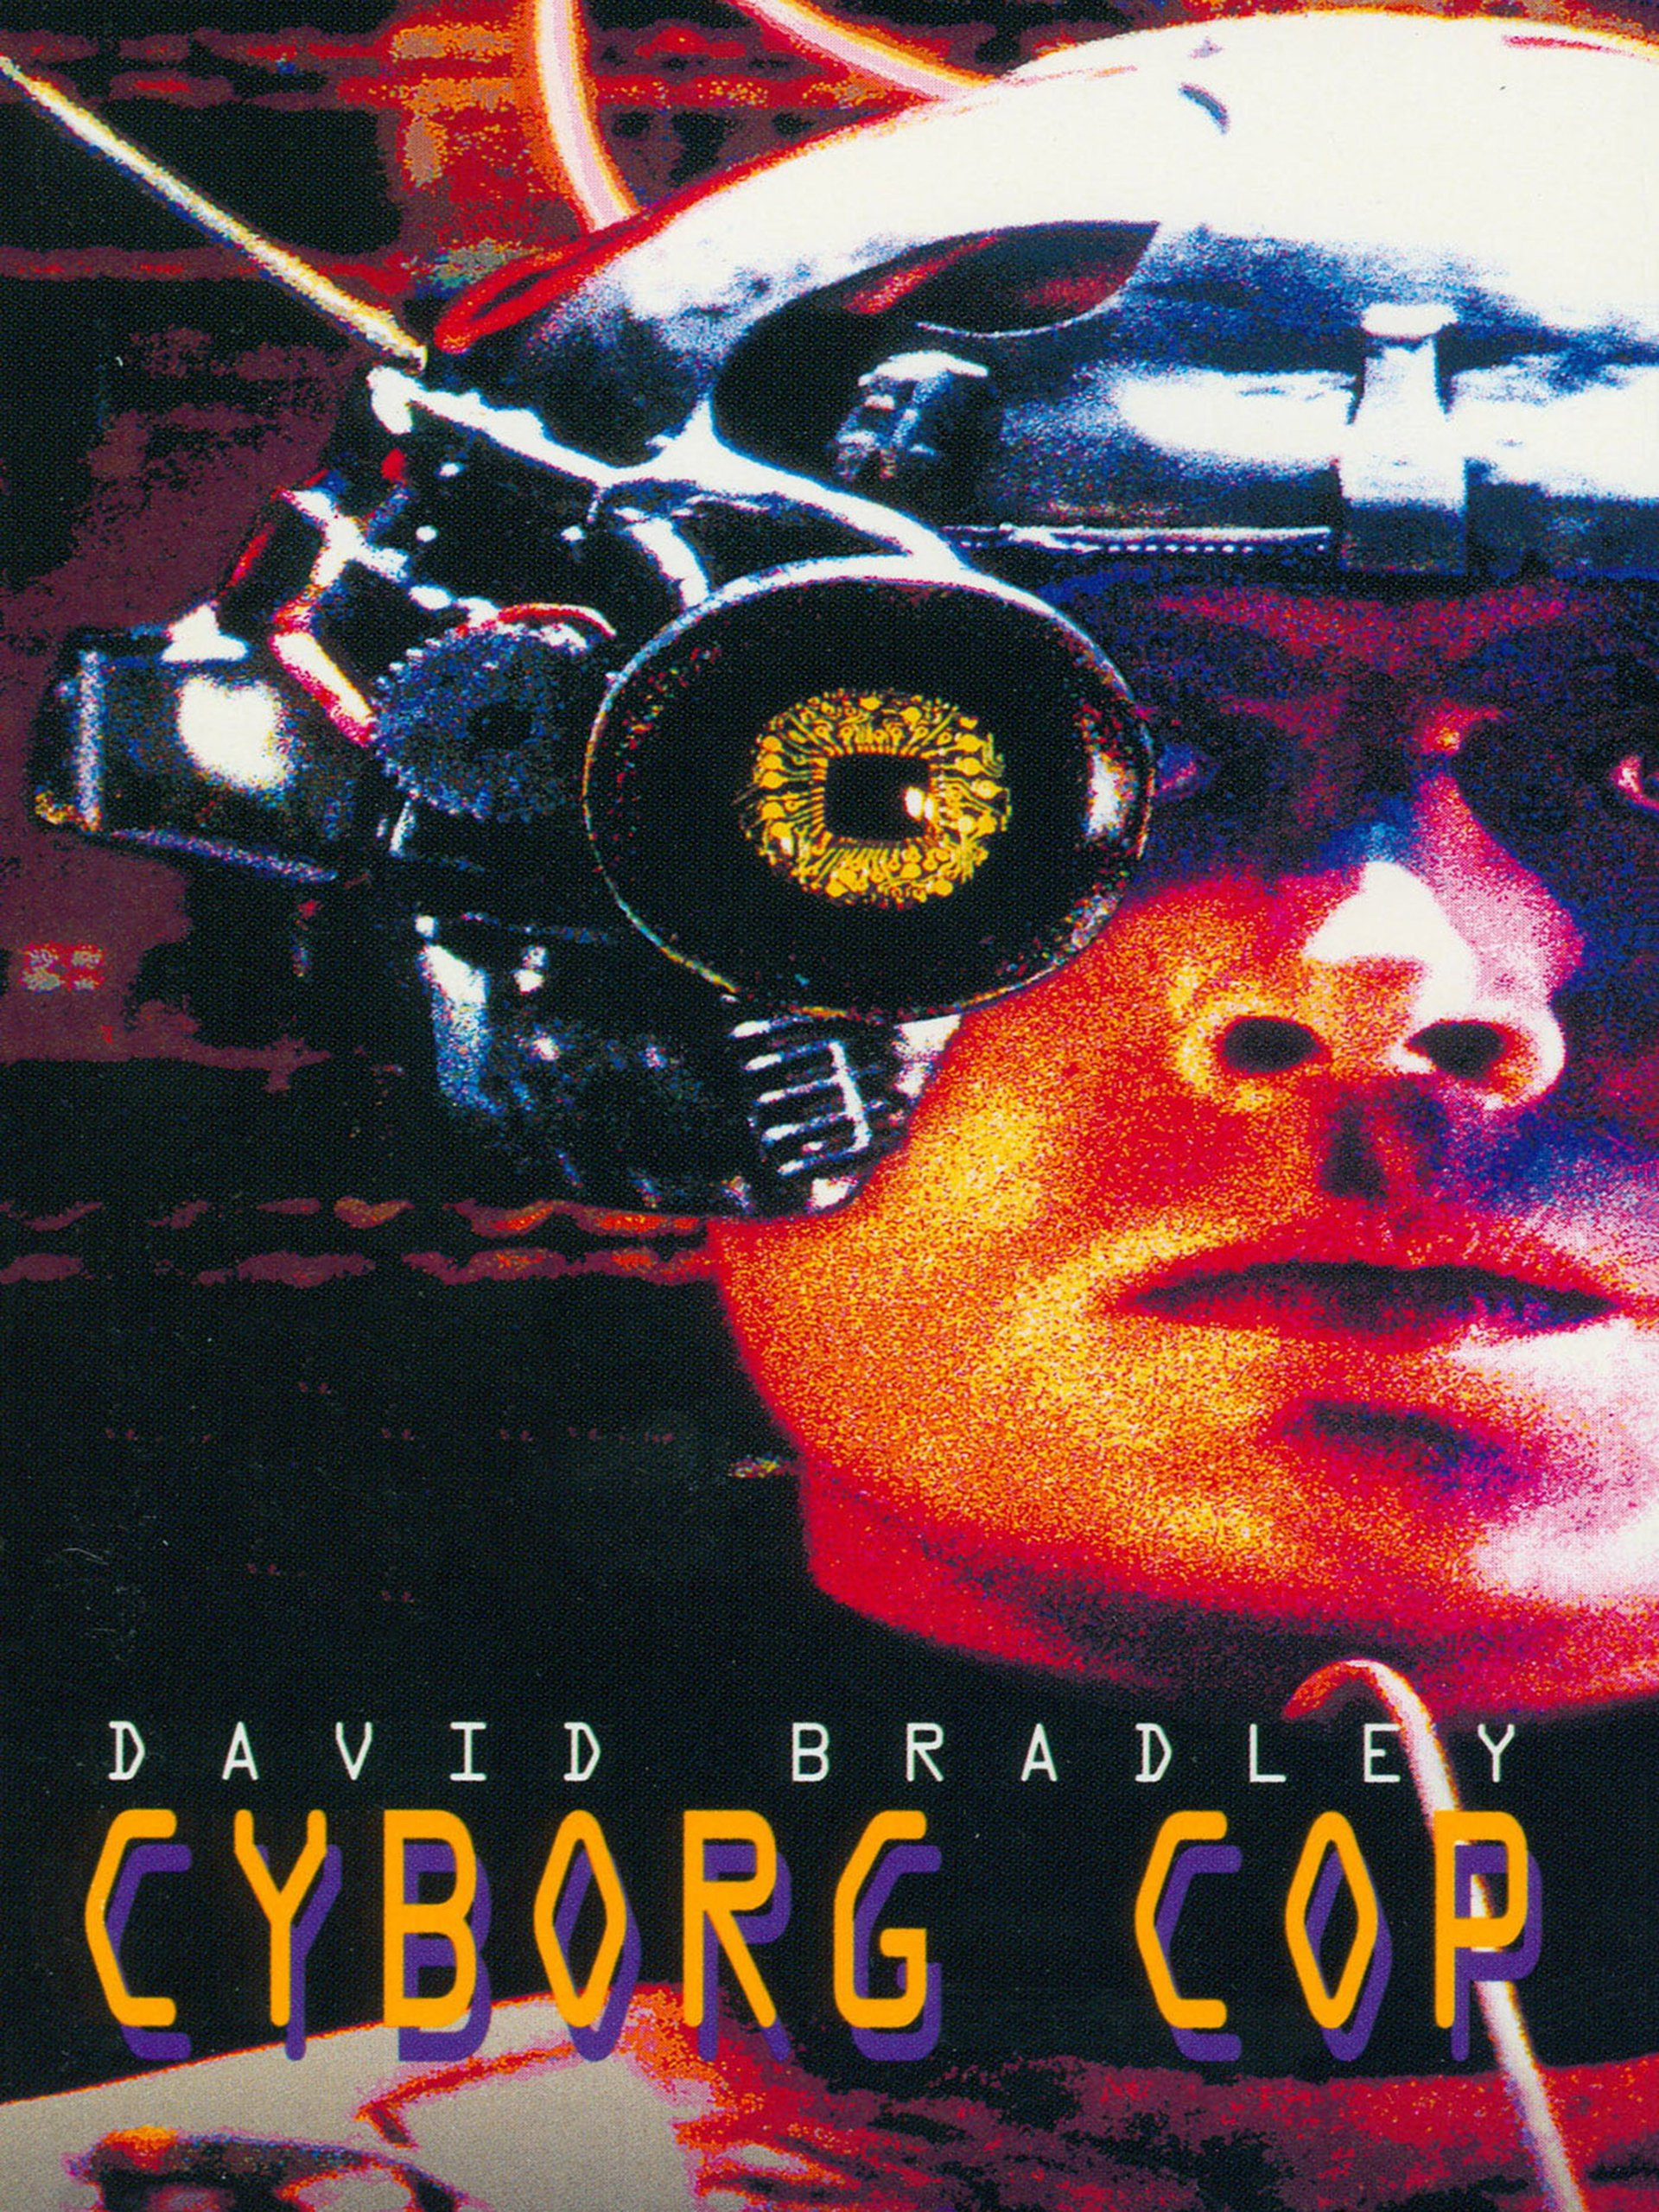 Watch Cyborg Cop | Prime Video